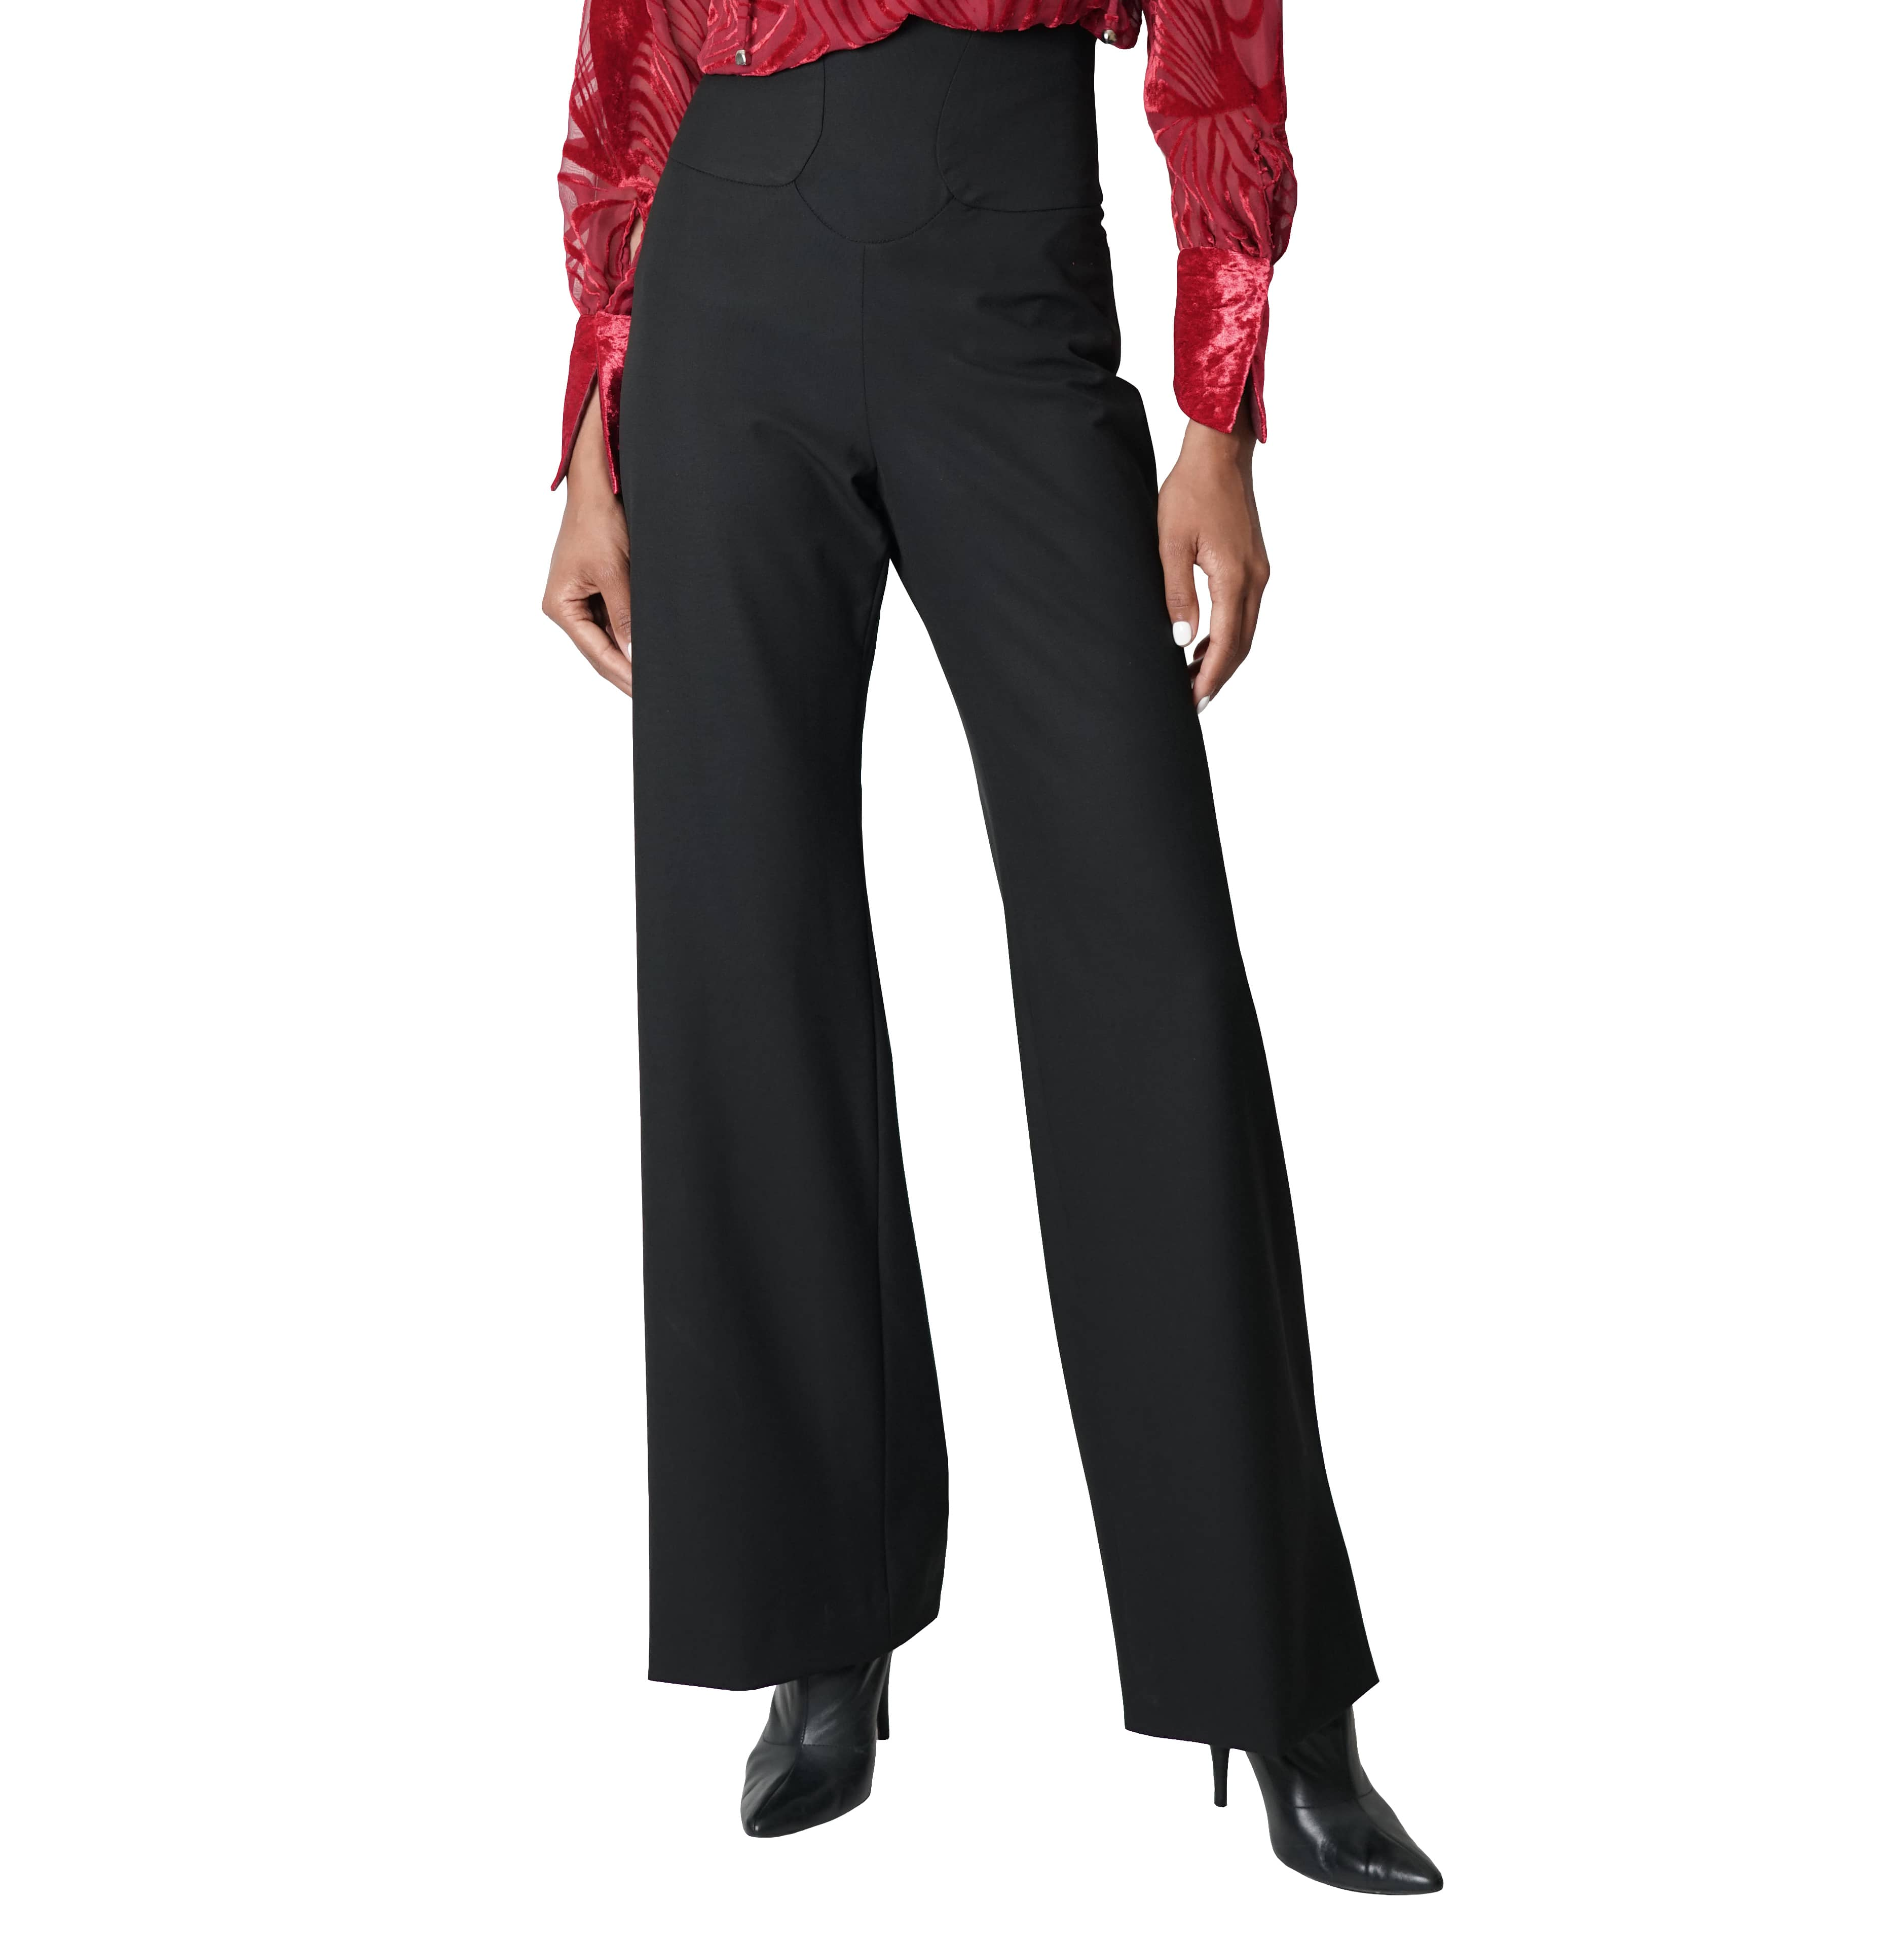 Trousers SCROIX 1